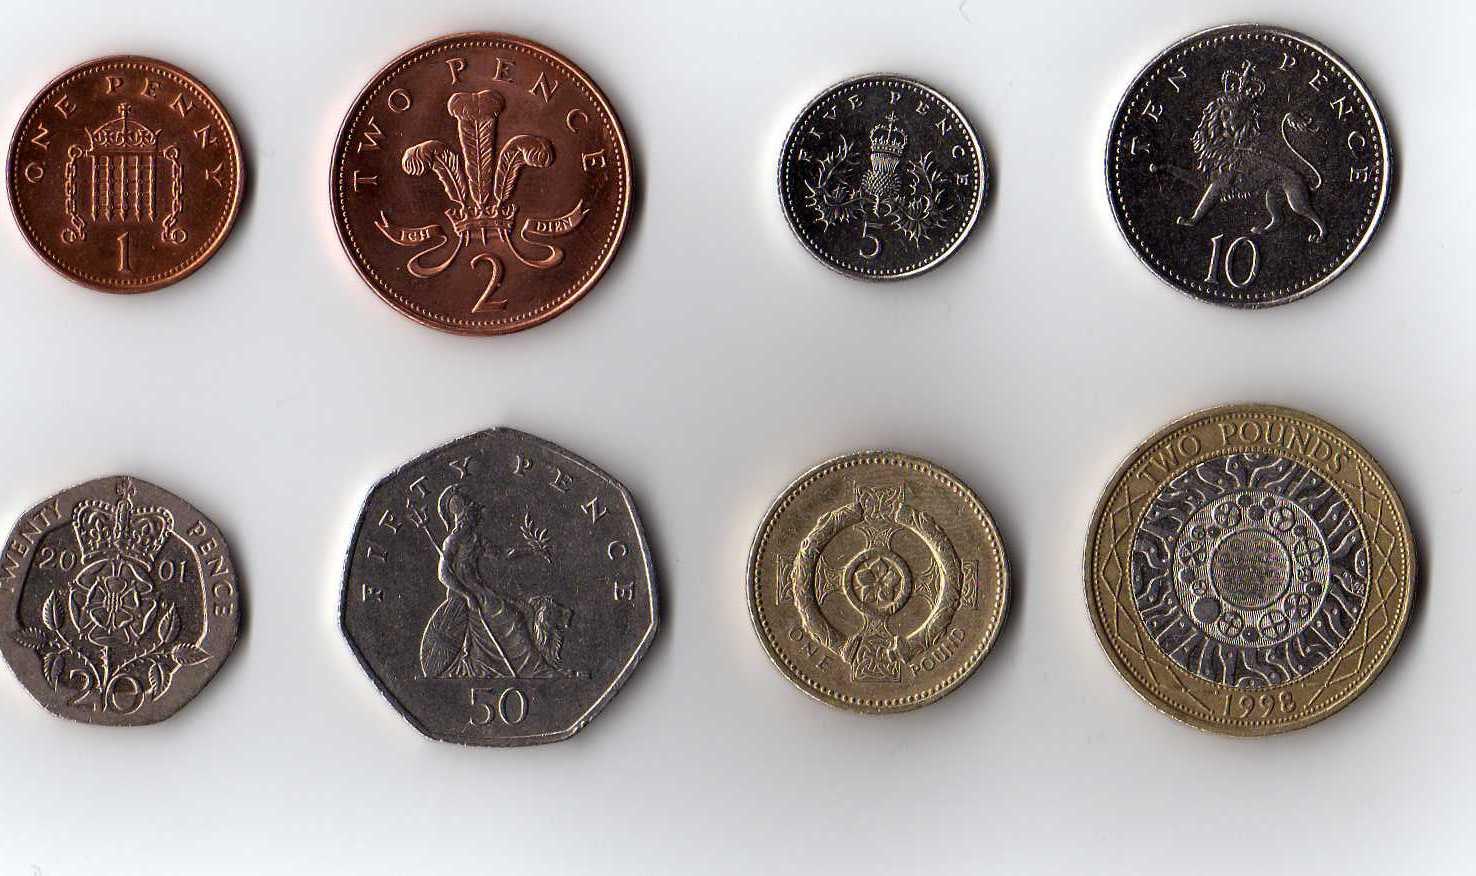 slike penija